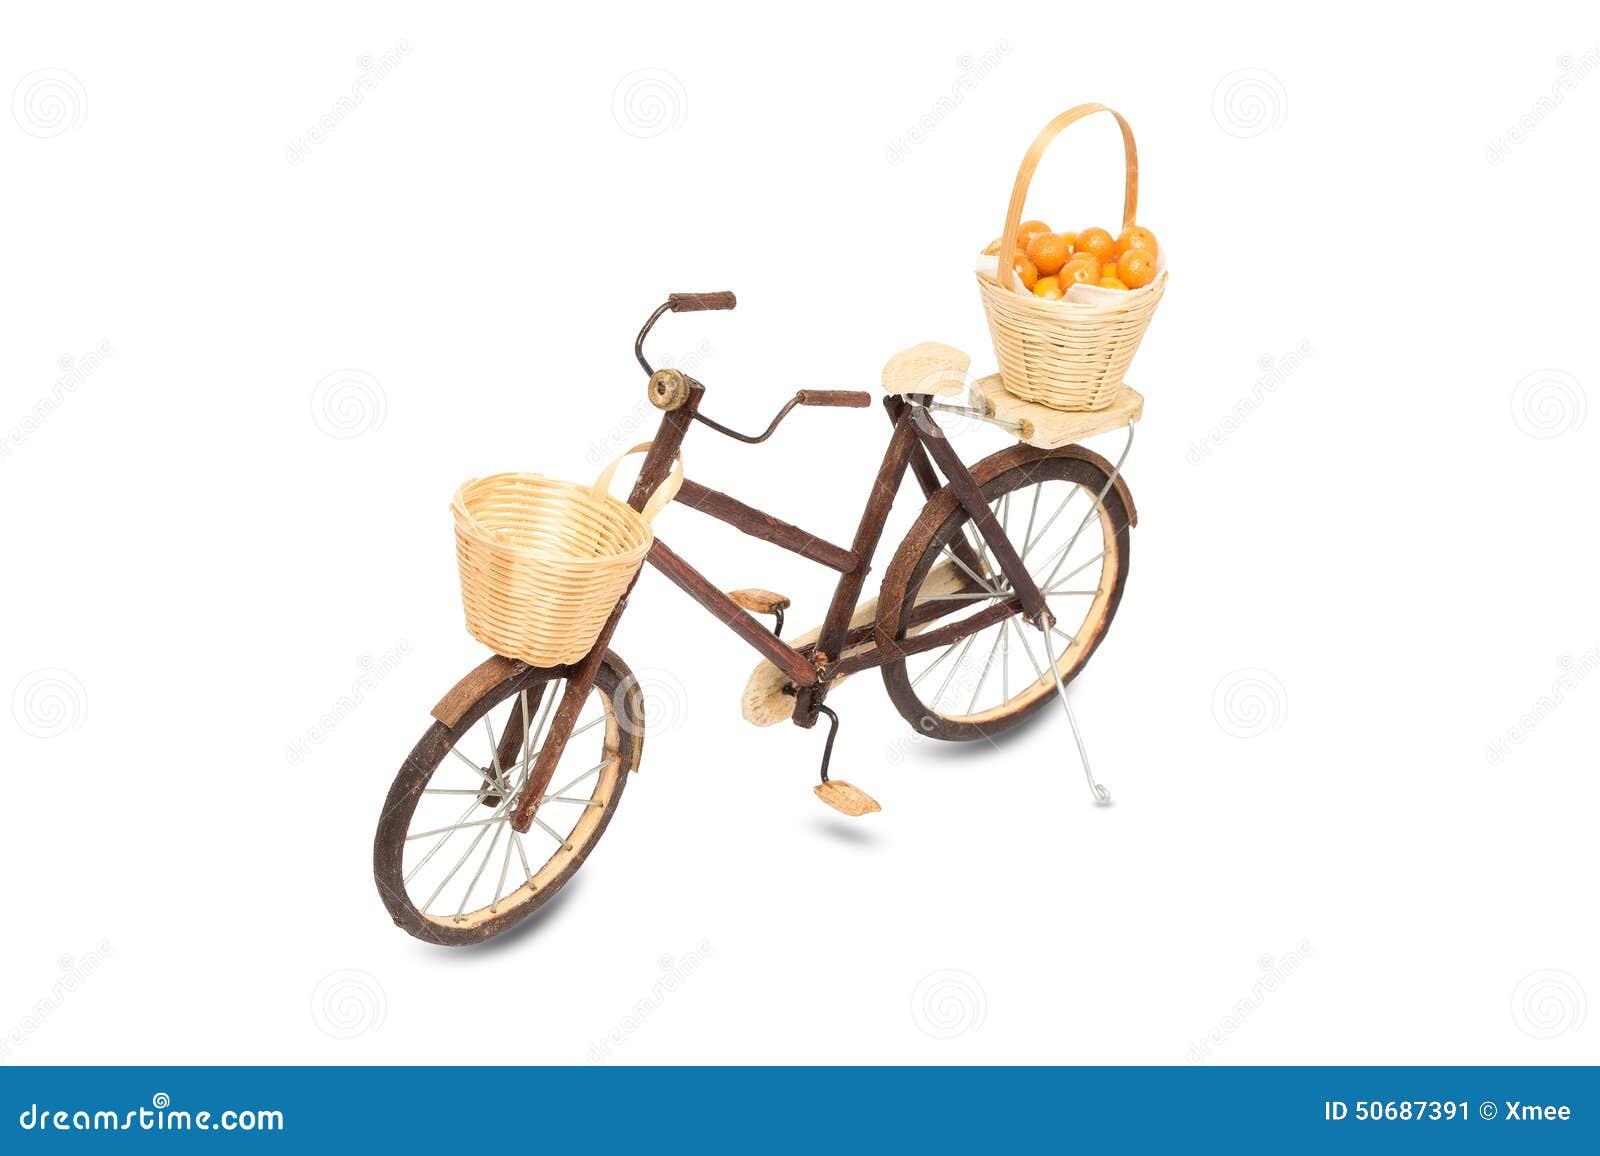 Download 木自行车玩具 库存图片. 图片 包括有 棍子, 草甸, 自行车骑士, brander, 天空, 骑自行车的人 - 50687391